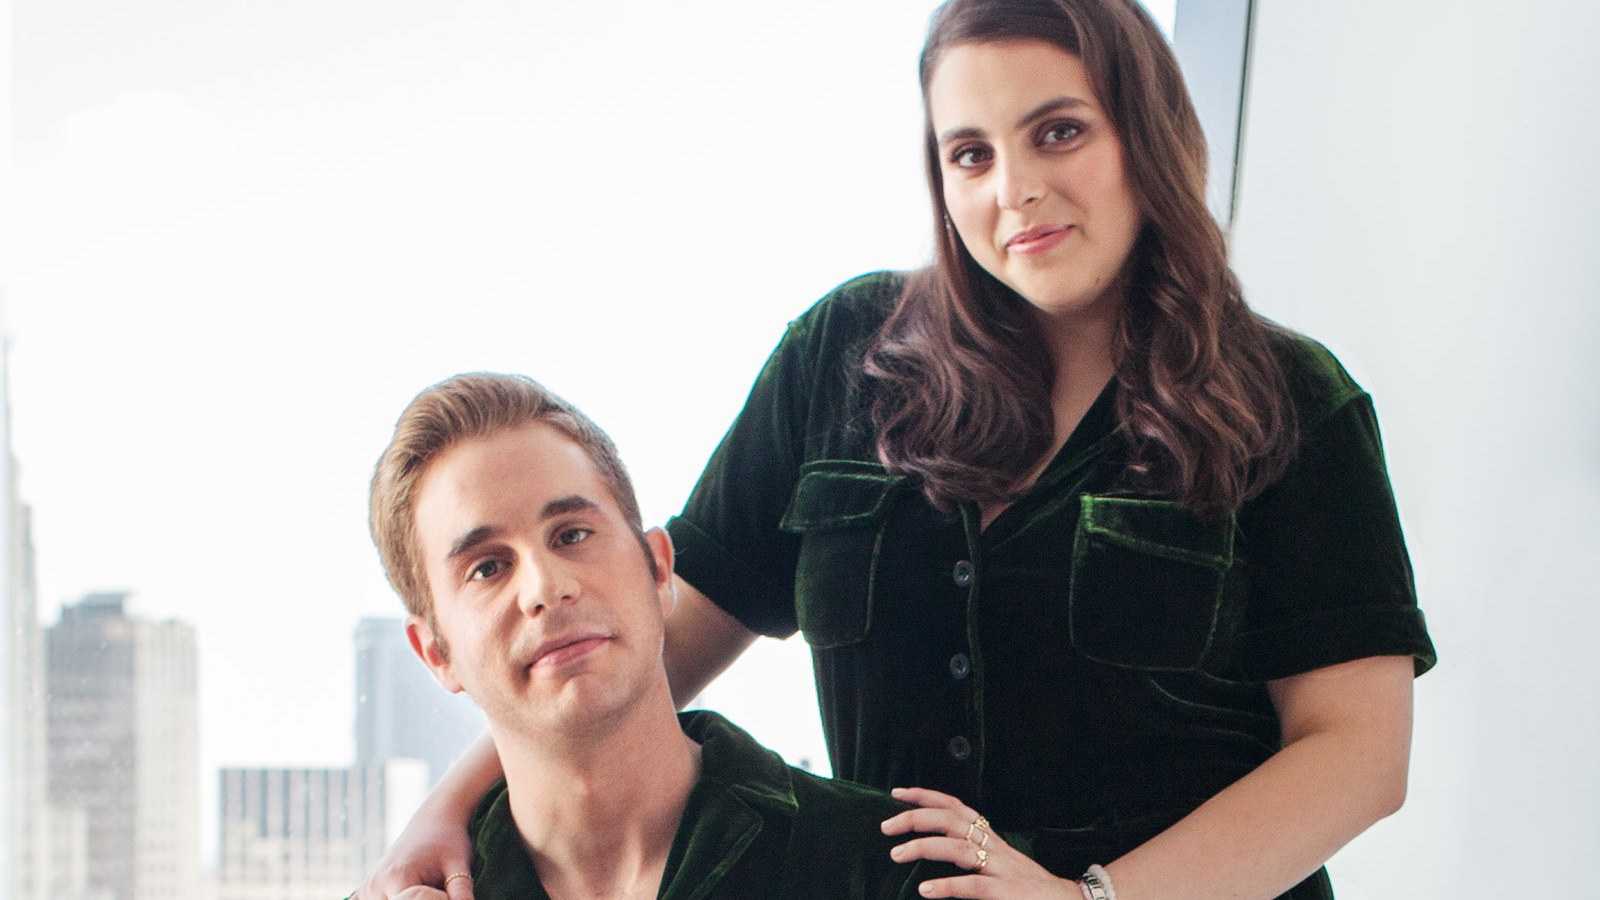 "VanityFair.com |Nov. 2017 - Ben Platt and Beanie Feldstein, the High-School ""Soul Mates"" Who Made It to Broadway Together"